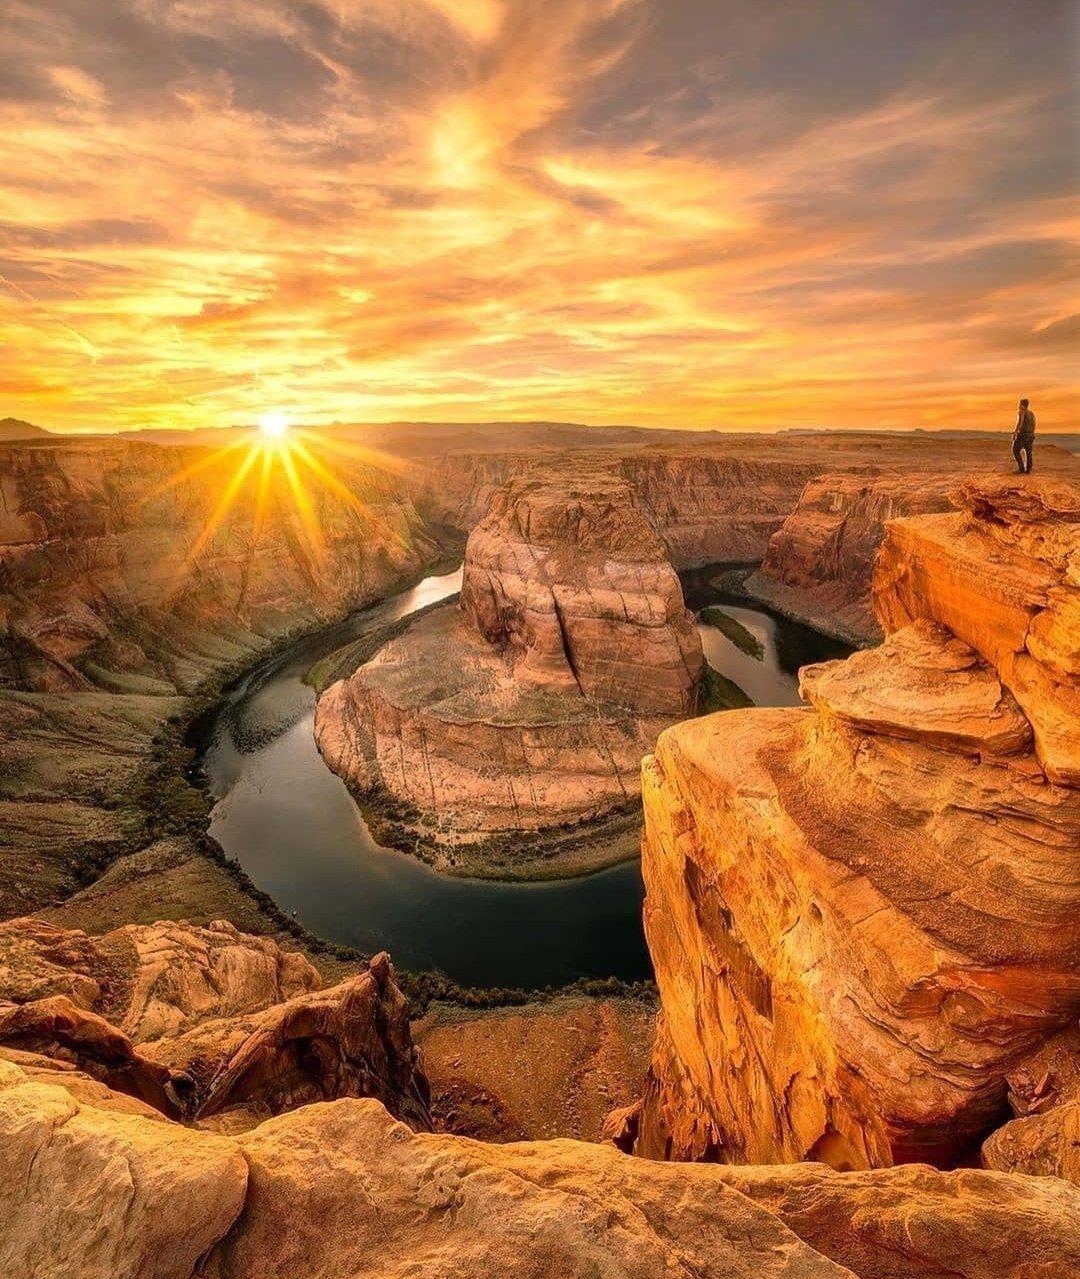 Sunset in Desert...🏜️ Arizona. https://t.co/QfaajLHClL